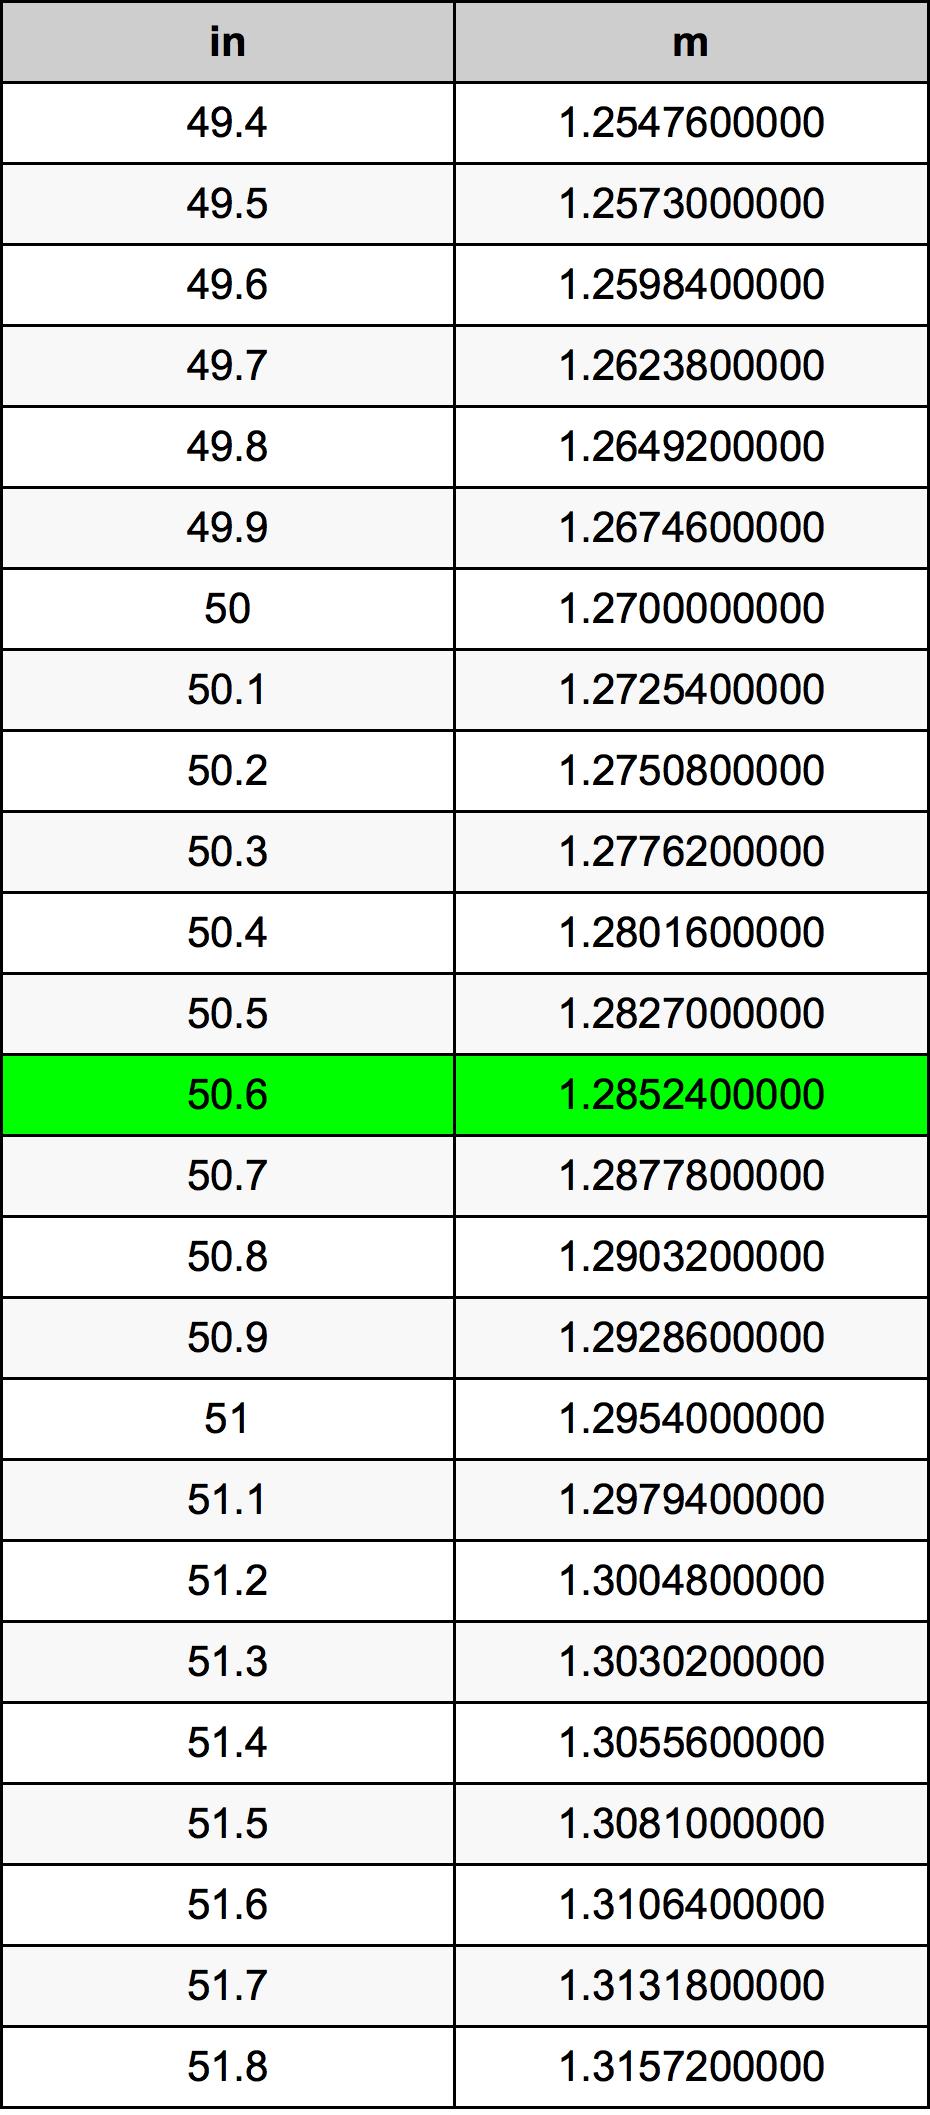 50.6 дюйм Таблица преобразования